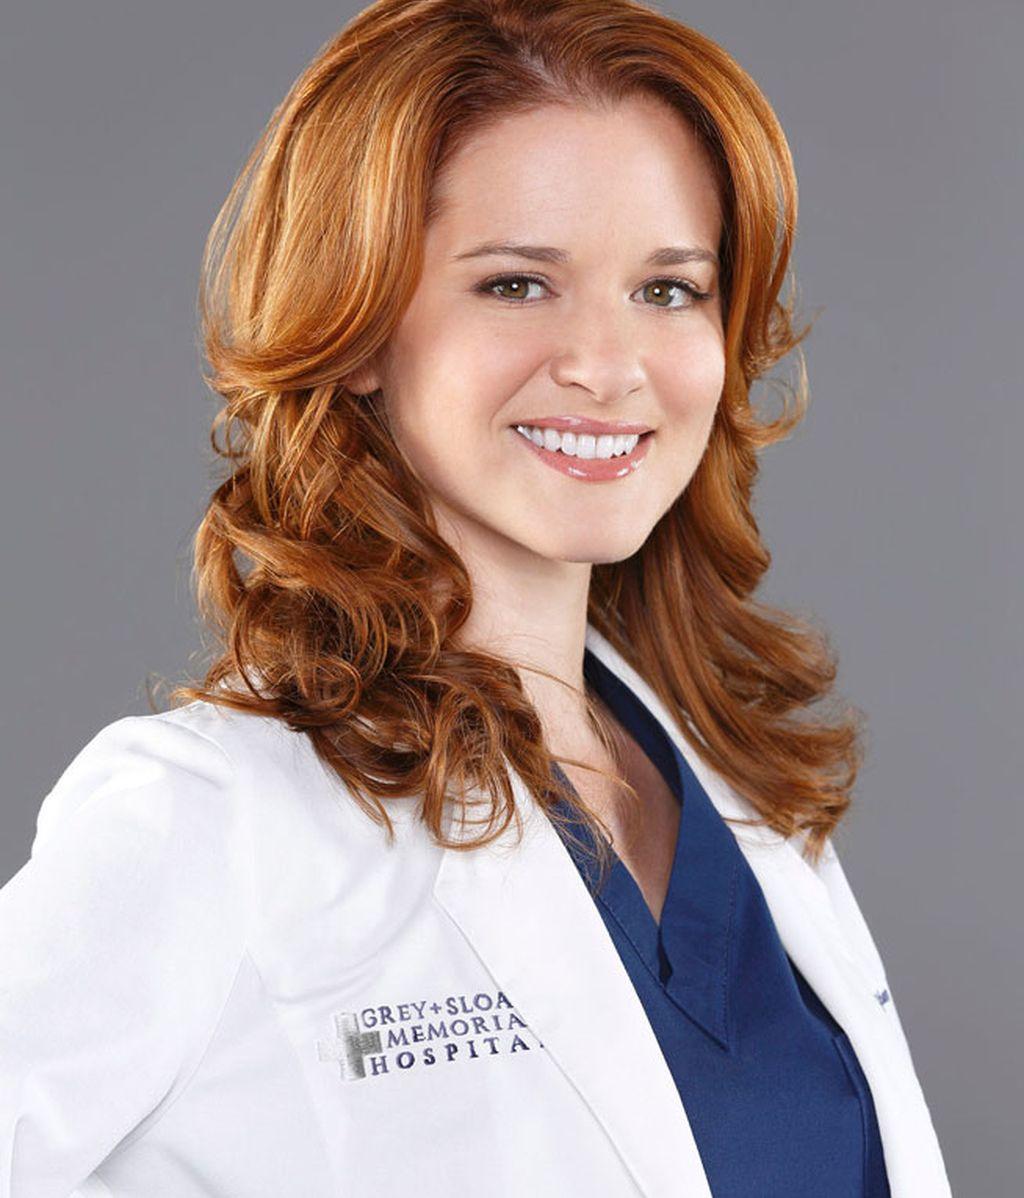 Sarah Drew interpreta a la Doctora April Kepner, mujer del doctor Avery